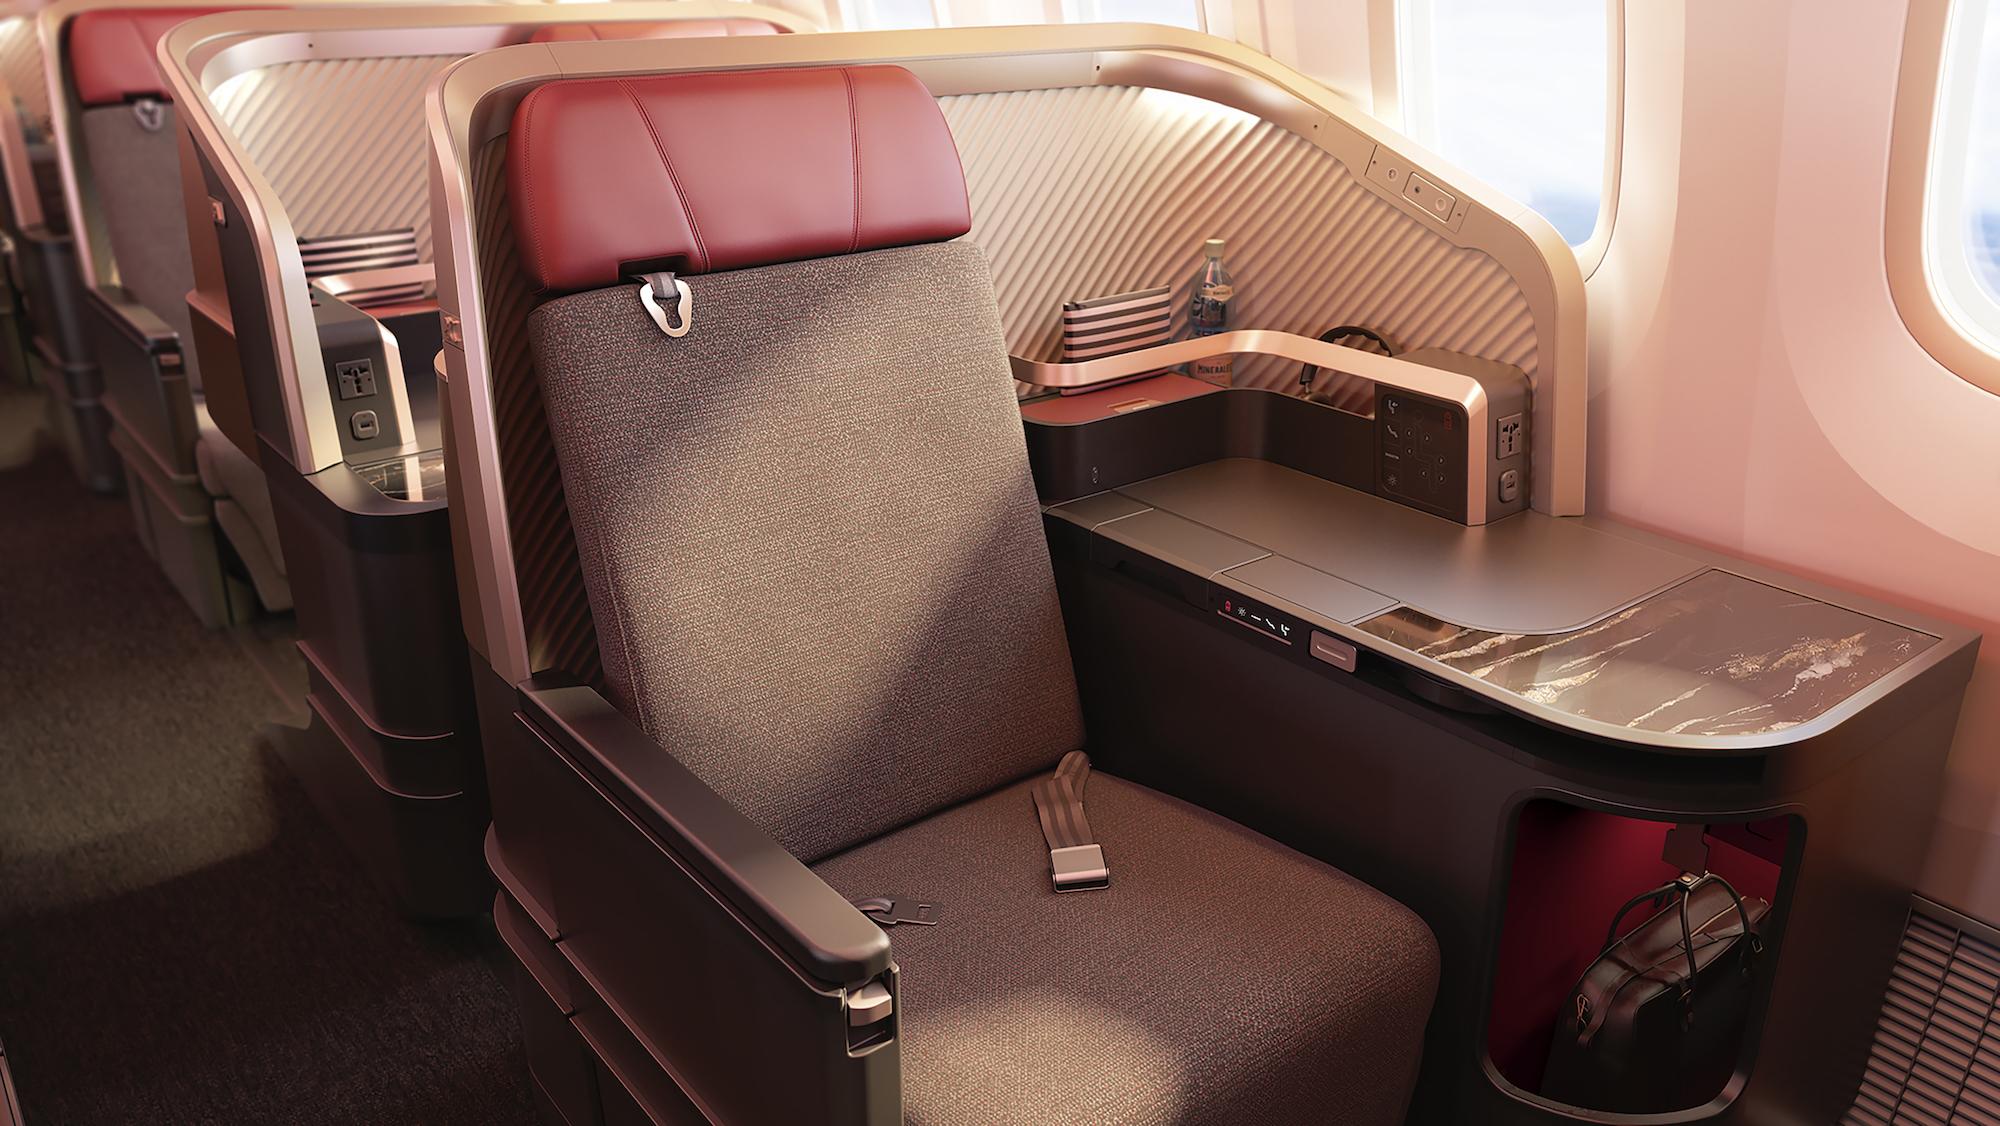 LA New J Seat 2 (PriestmanGoode)